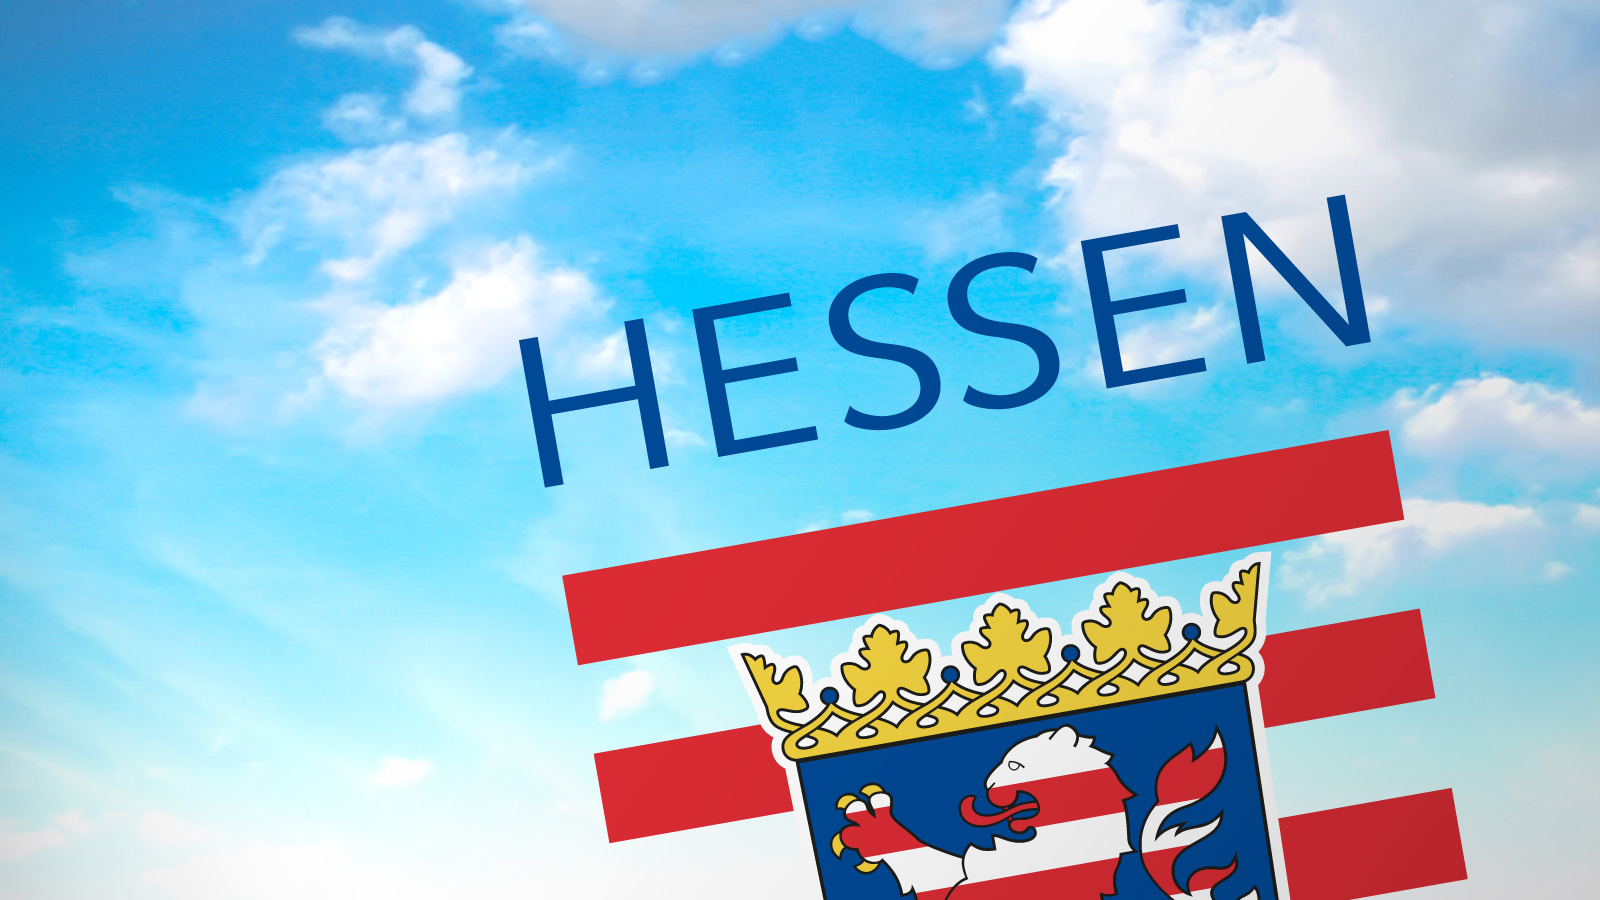 Www.Hessen News